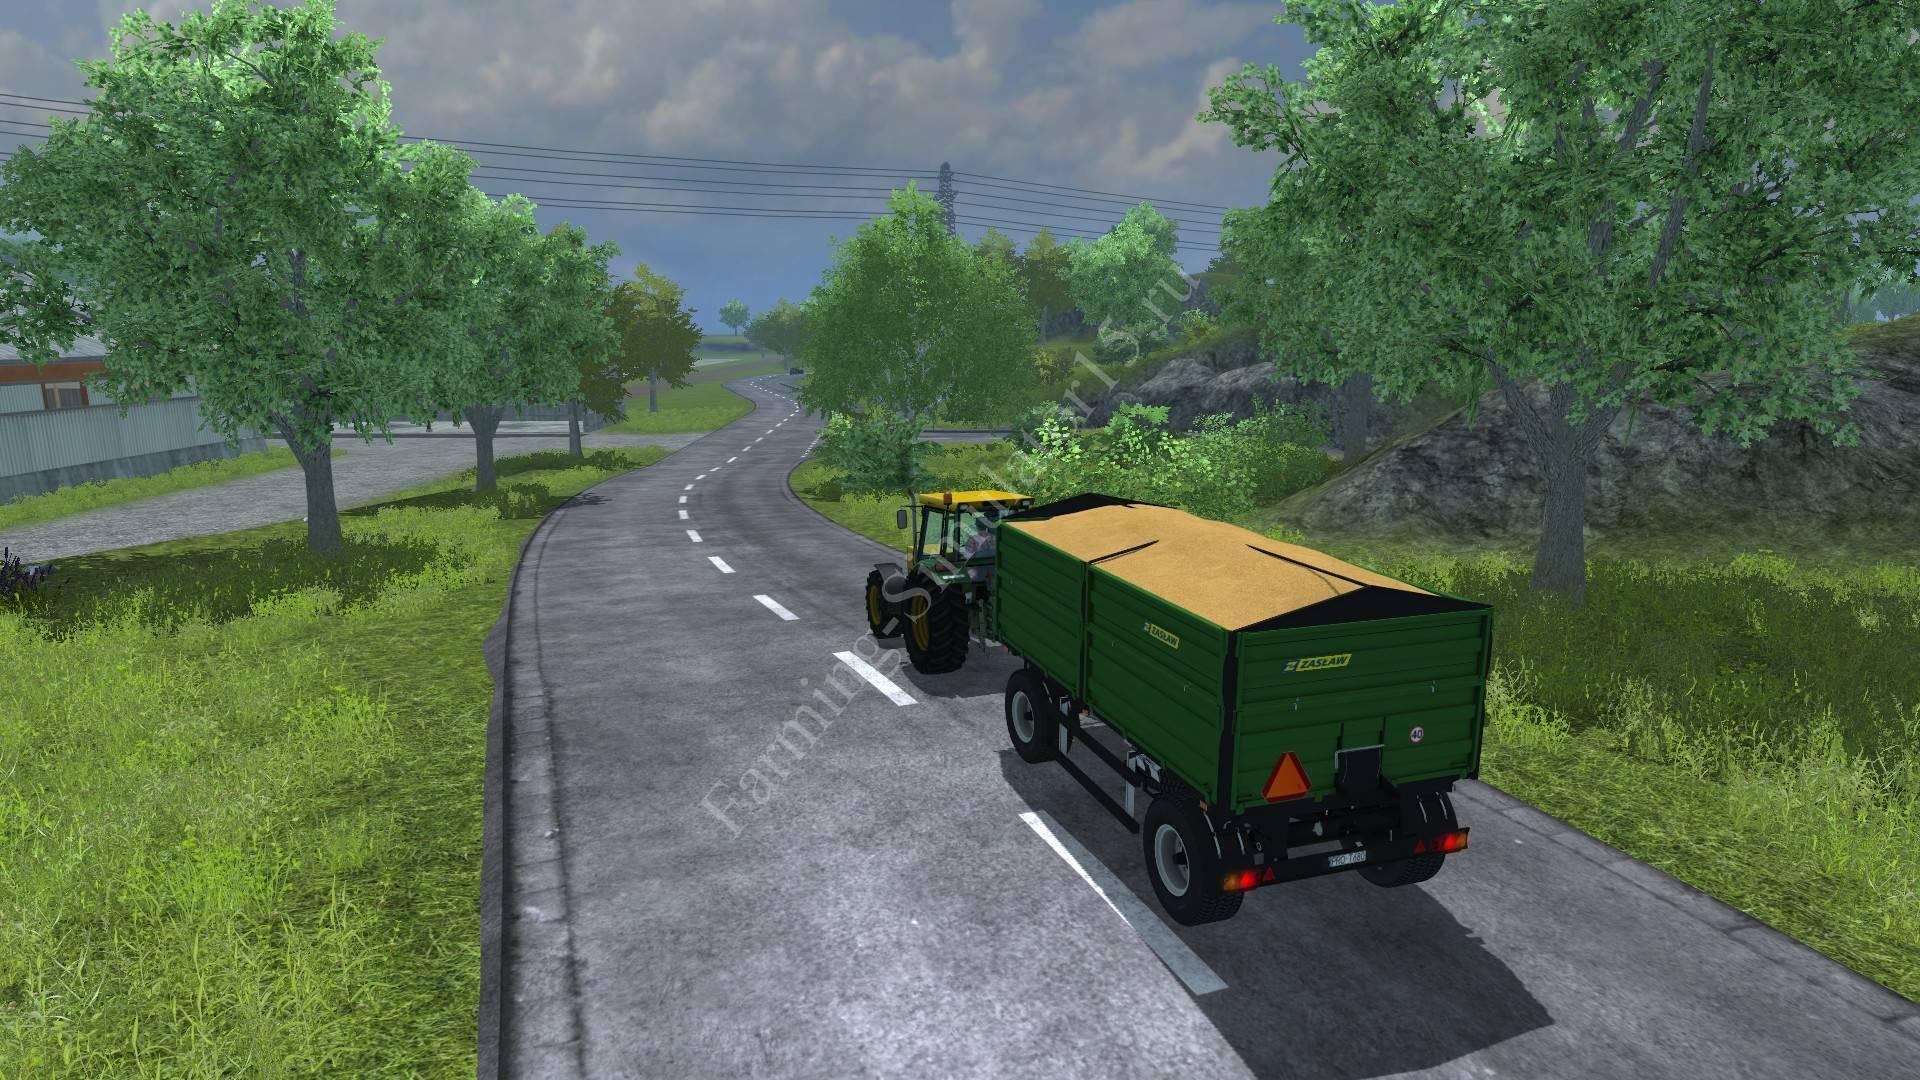 Мод прицепа с поворотным кругом Zaslaw D 737AZ Green v 2.0 Farming Simulator 2013, Farming Simulator 13